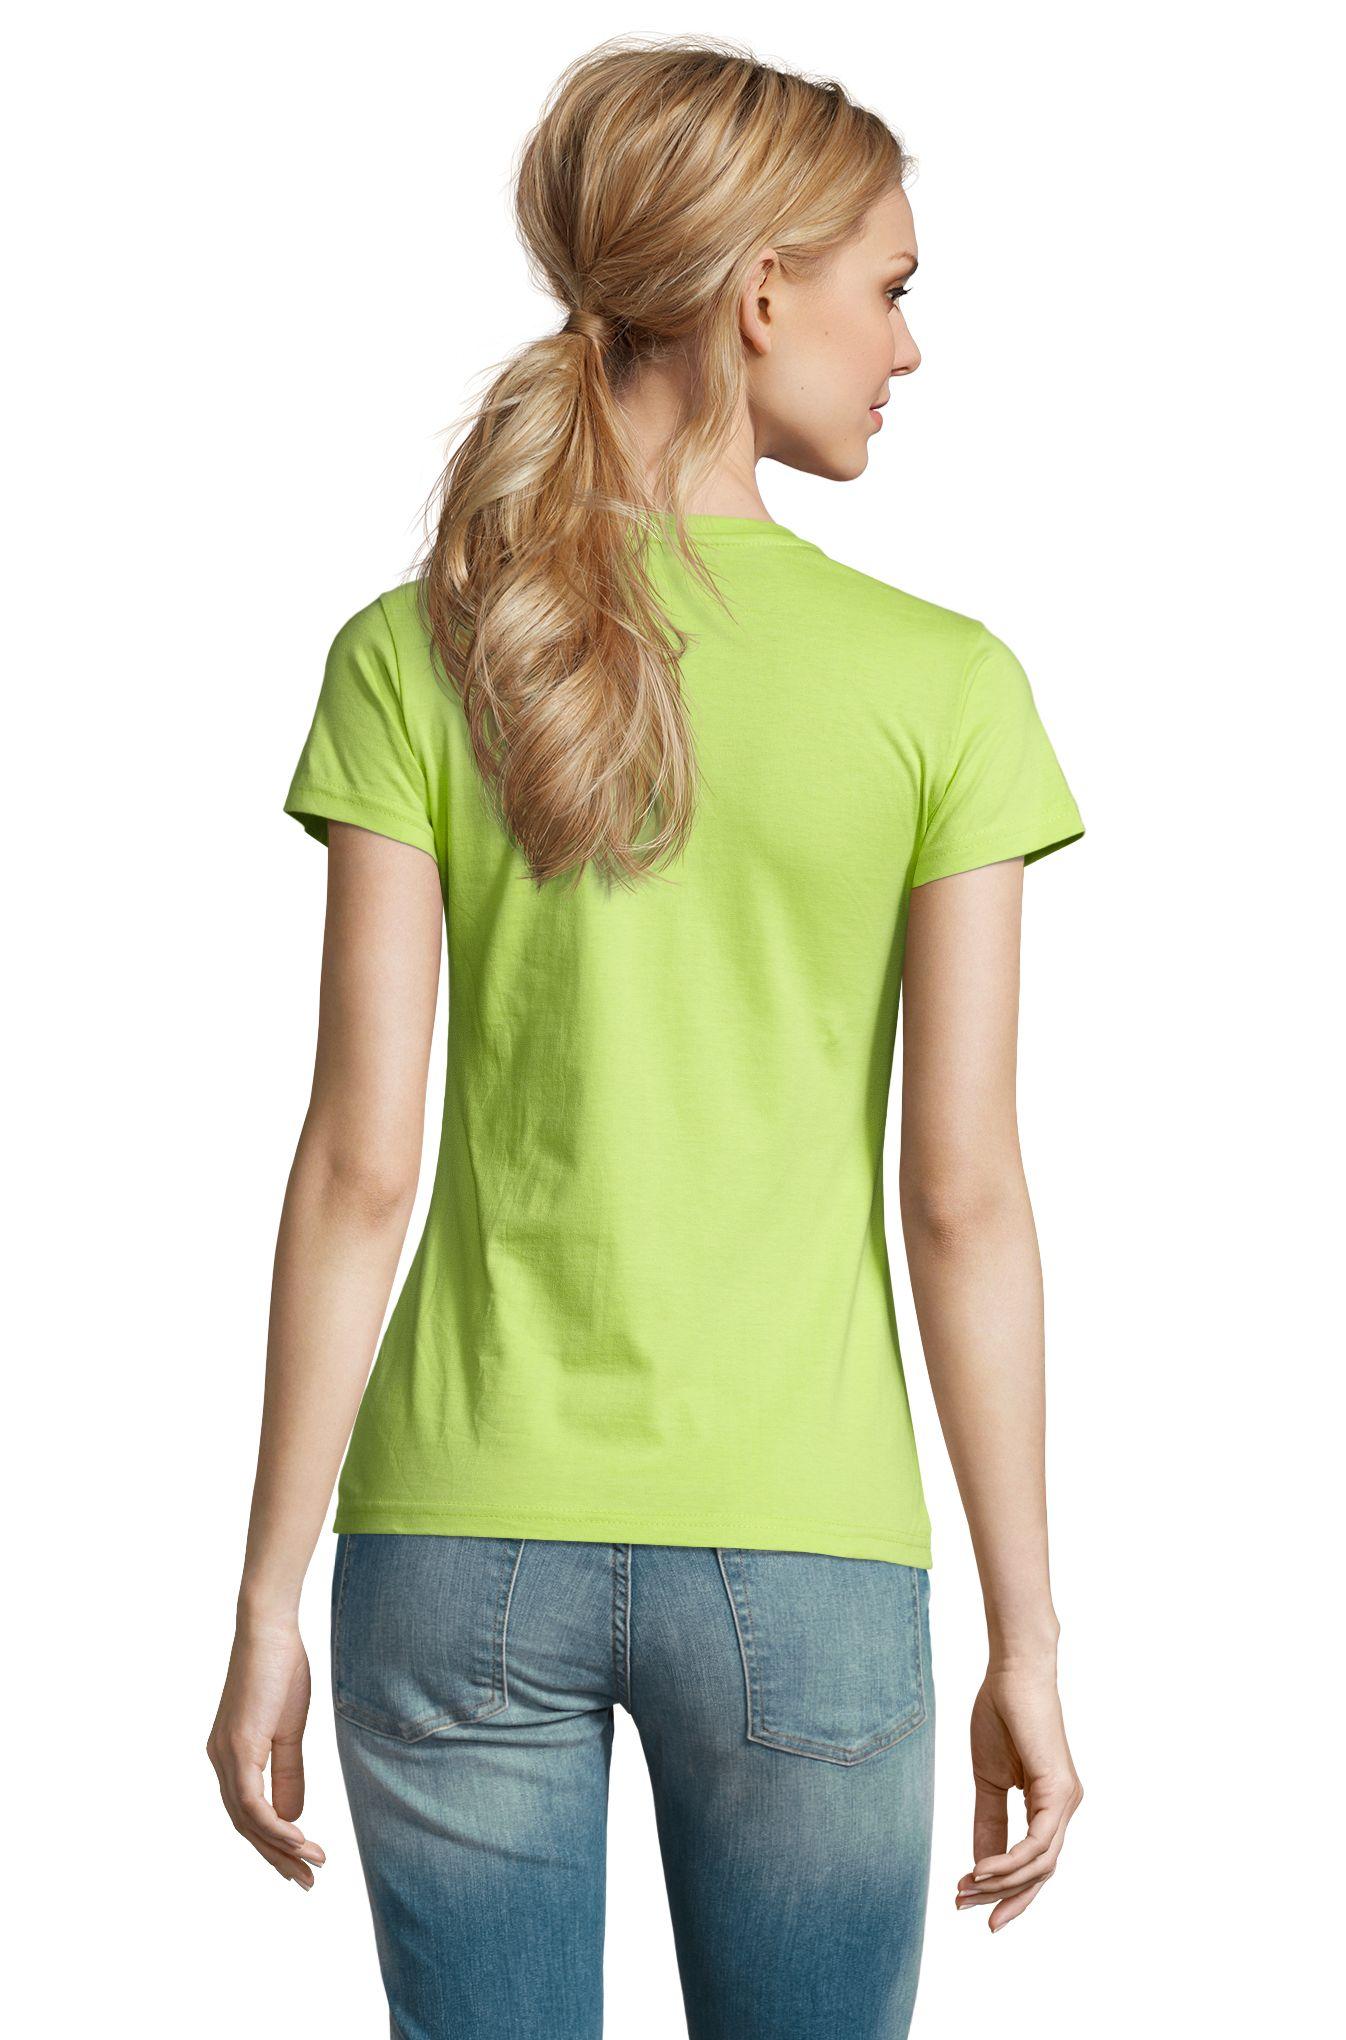 280 - Apple green